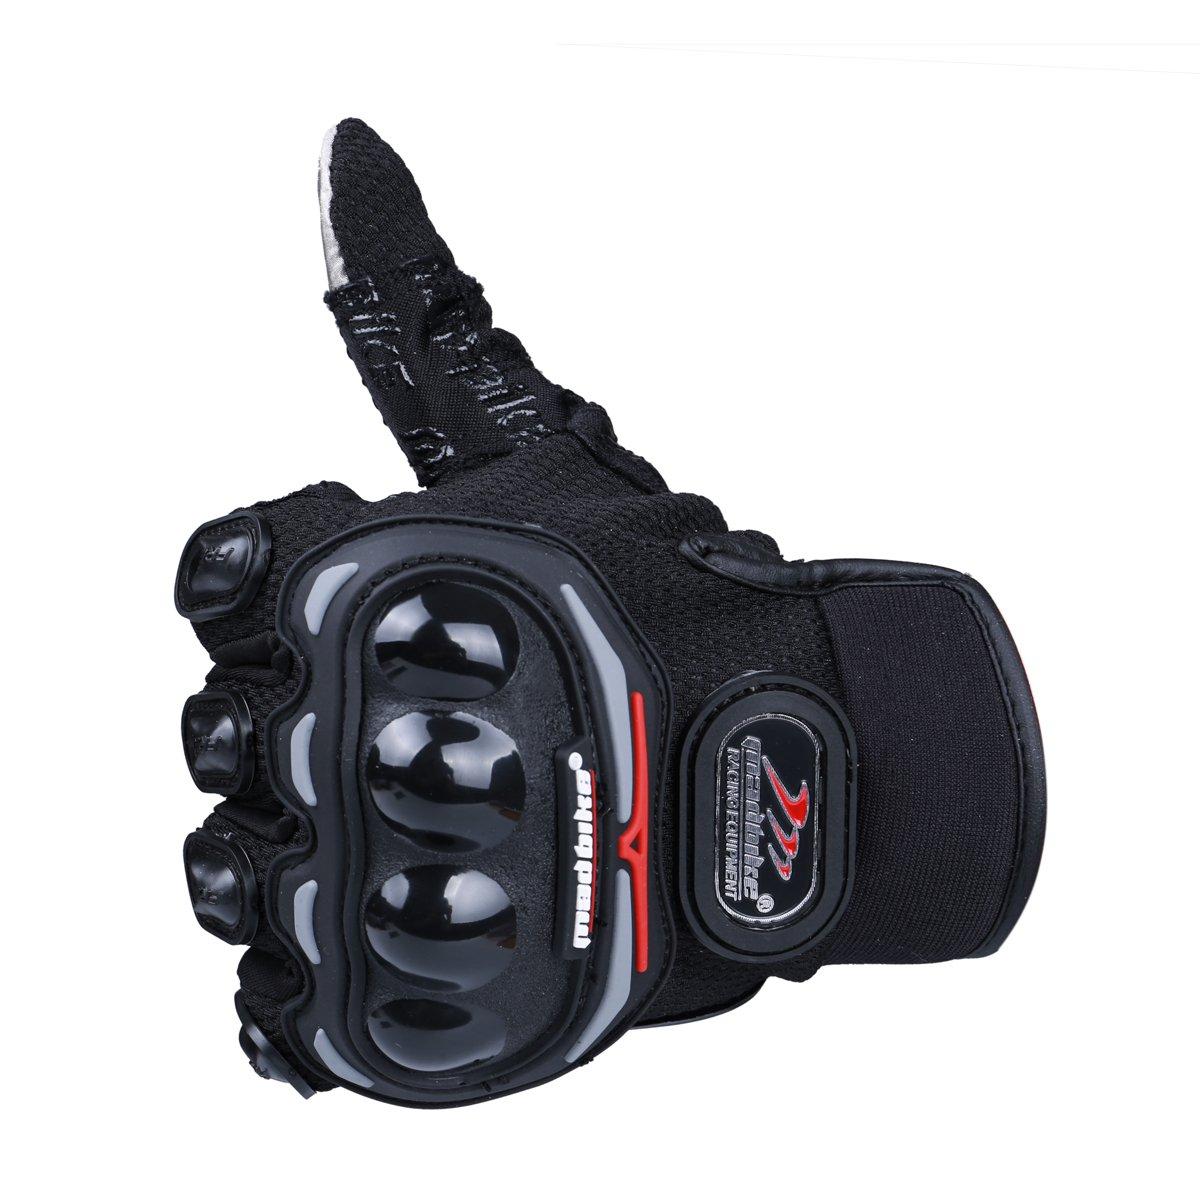 Madbike Gants de moto d/ét/é mesh /écran tactile transpirable Medium, black